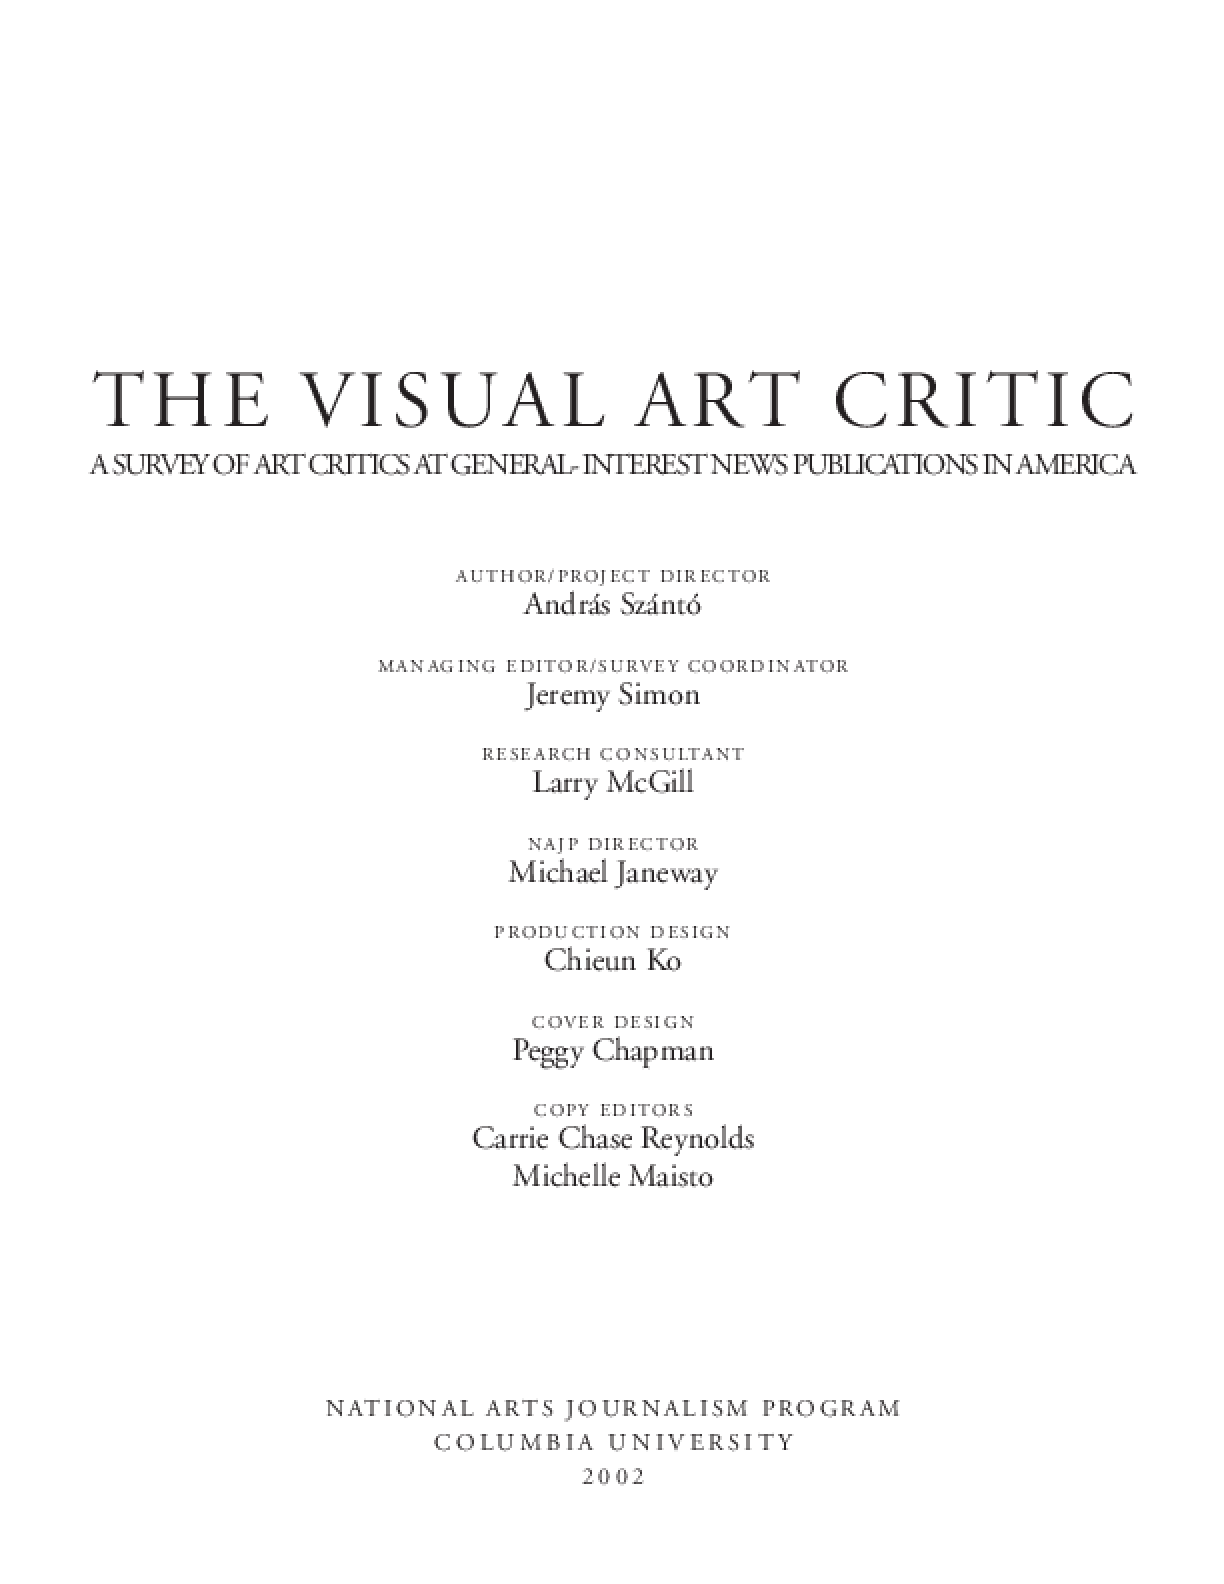 The Visual Art Critic: A Survey of Art Critics at General Interest News Publications in America